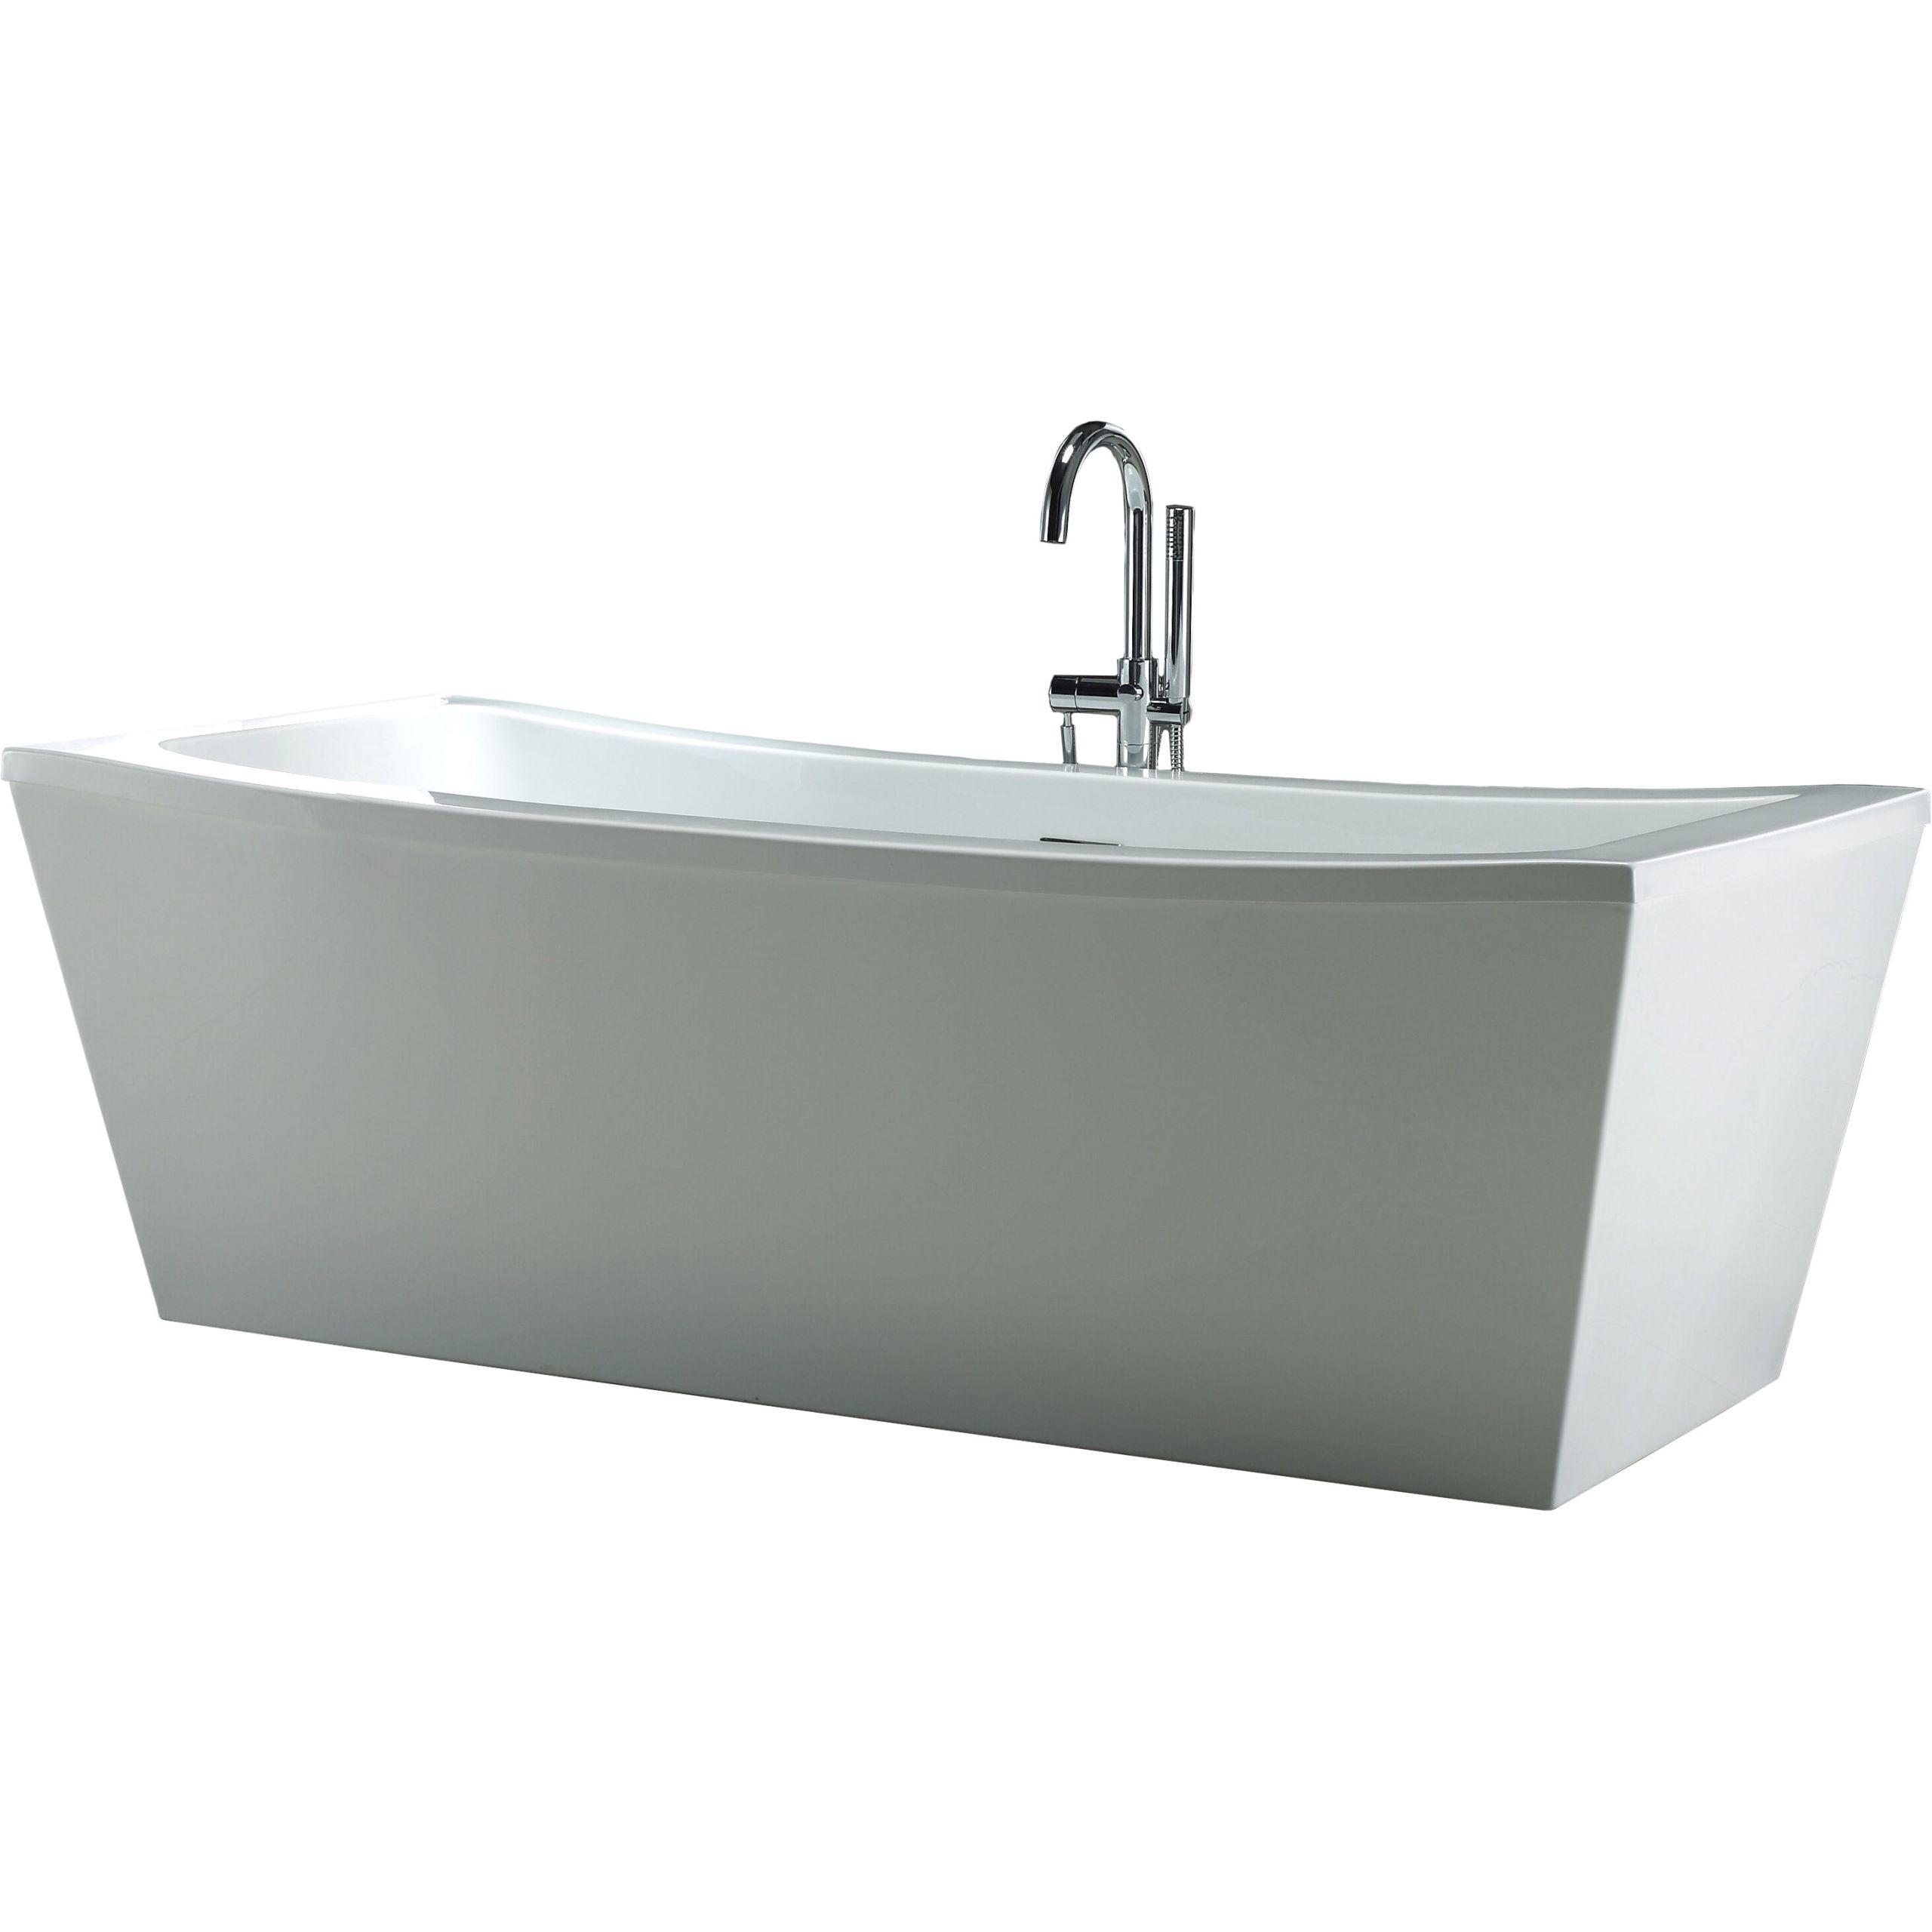 Ove Decors Terra 70 x 34 25 Soaking Bathtub XOV1154